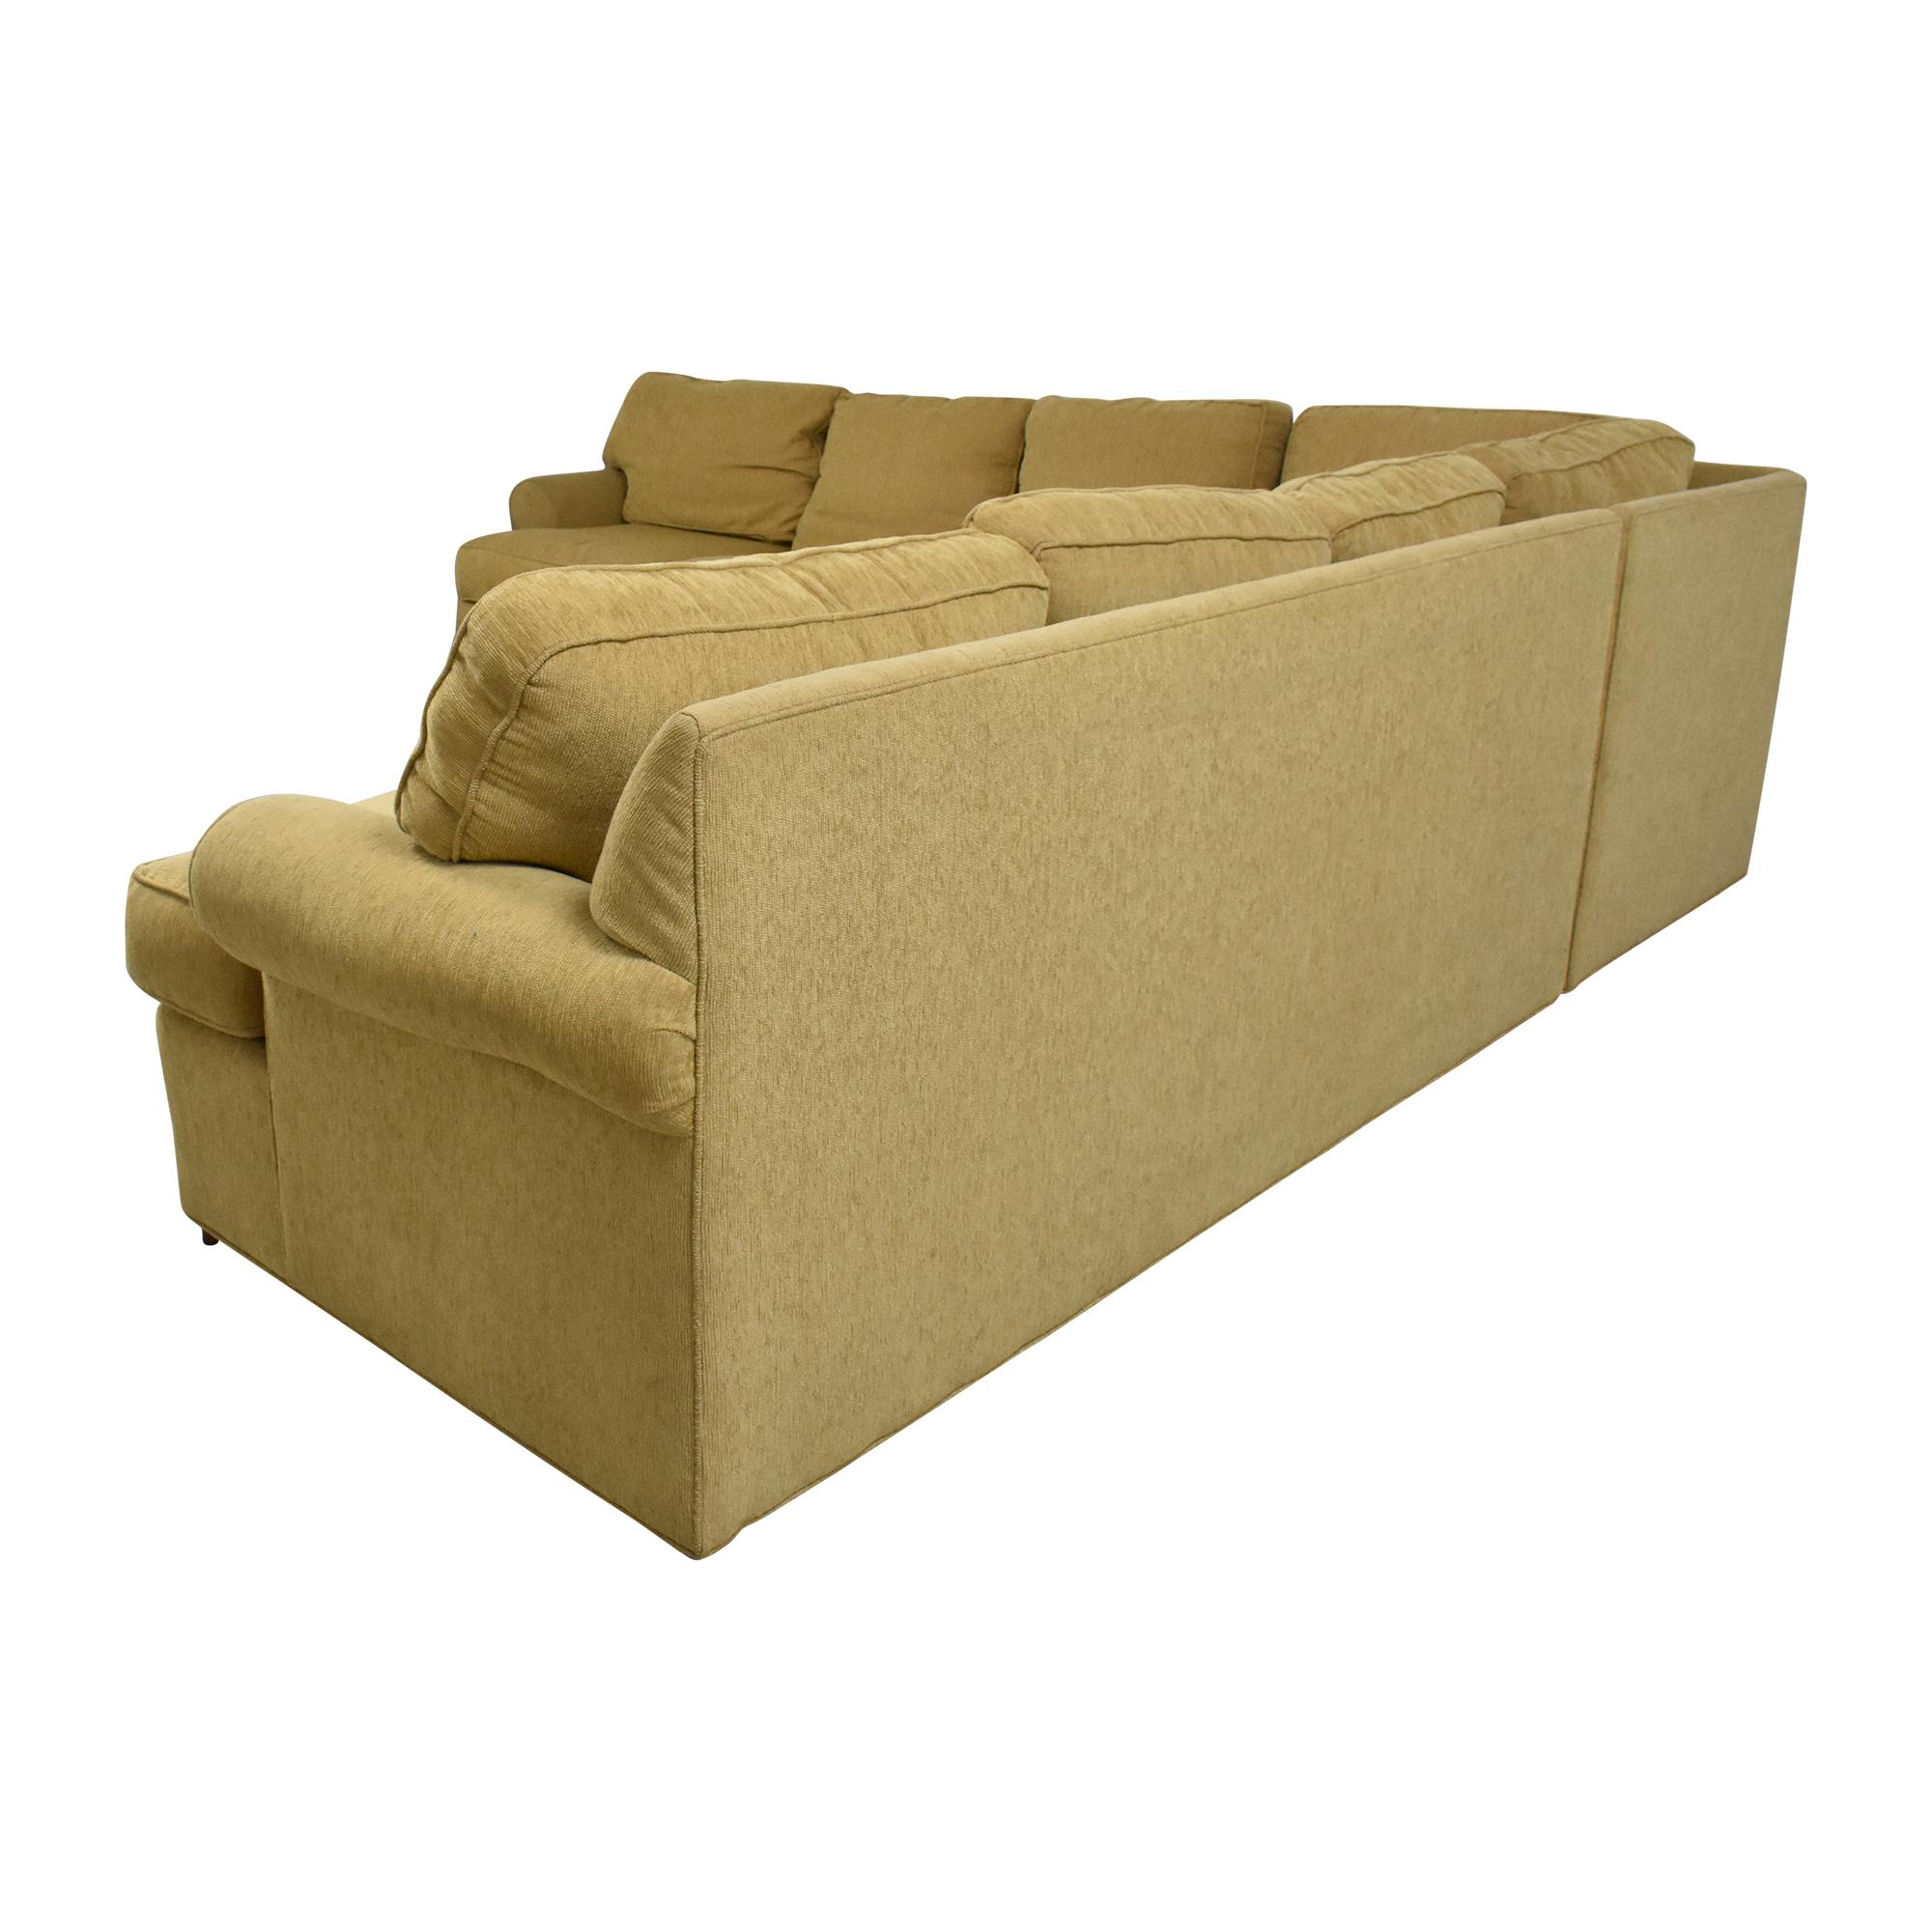 Ethan Allen Ethan Allen Roll Arm Sectional Sofa ma